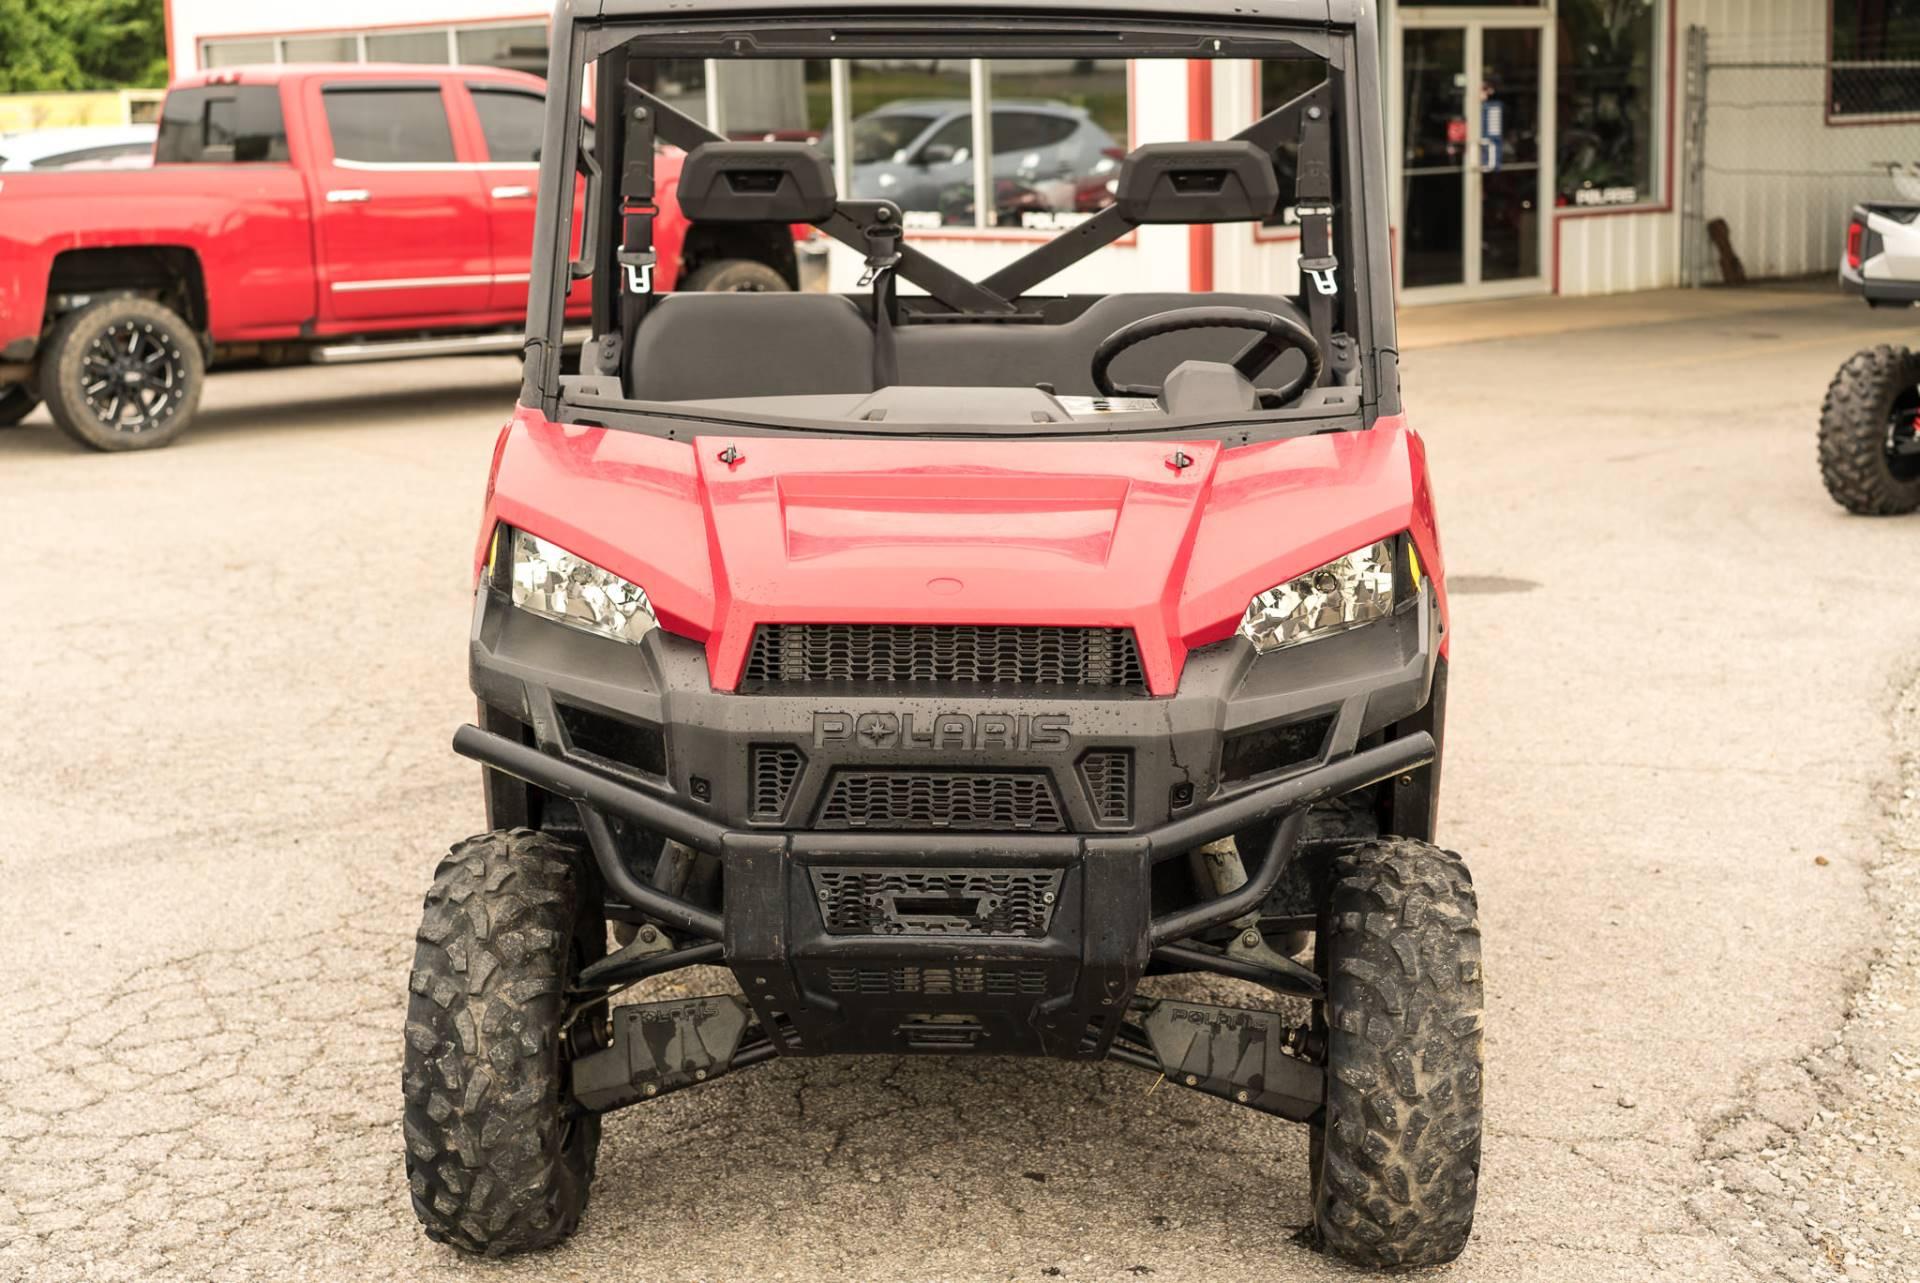 2015 Polaris Ranger570 Full Size 3